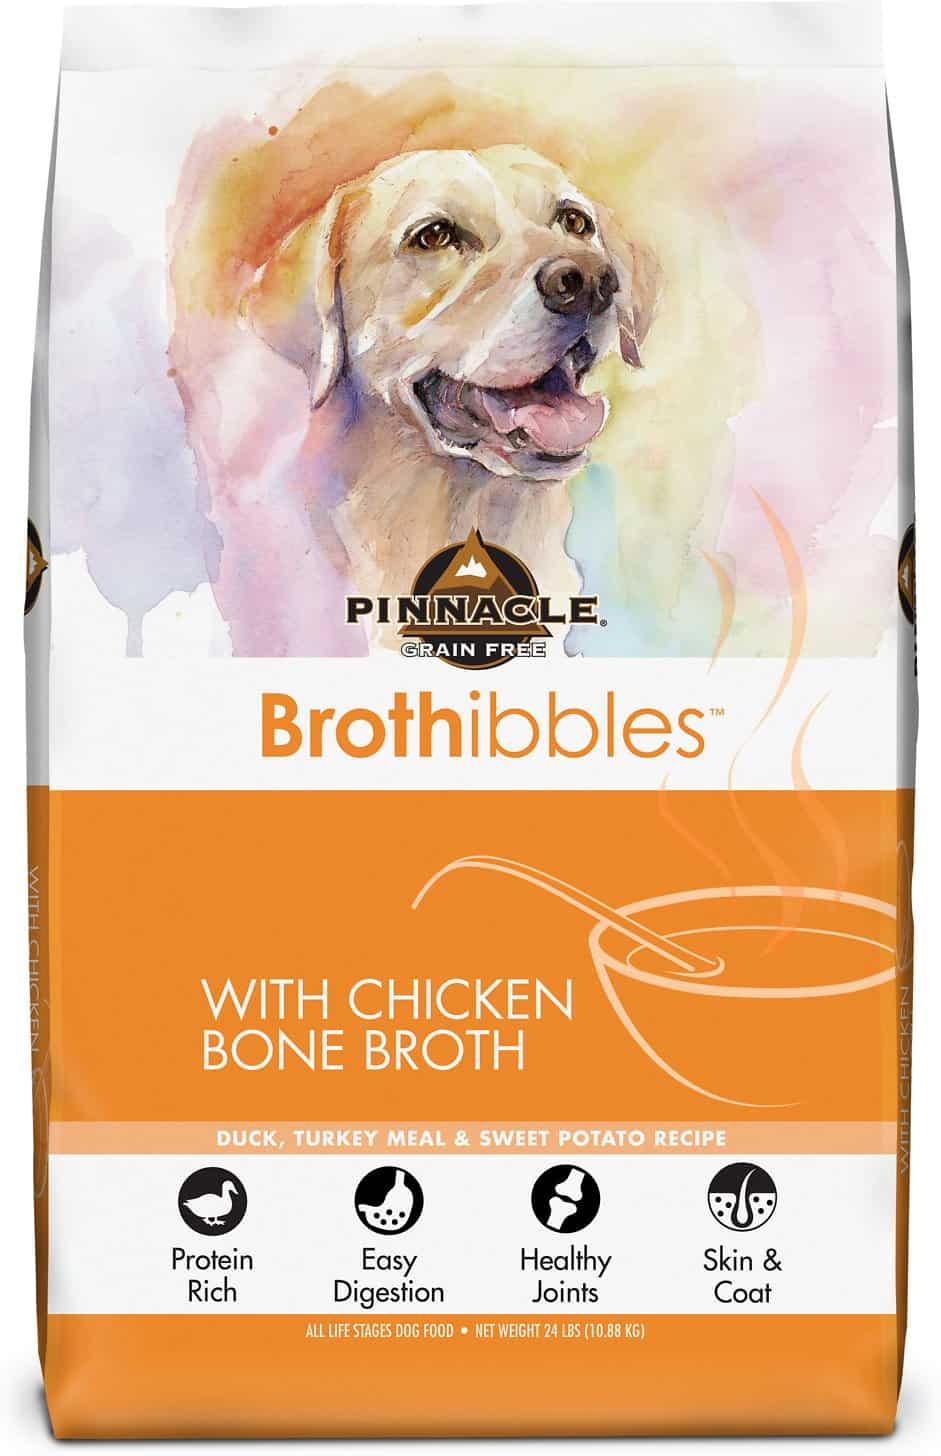 Pinnacle Dog Food: 2021 Review, Recalls & Coupons 9